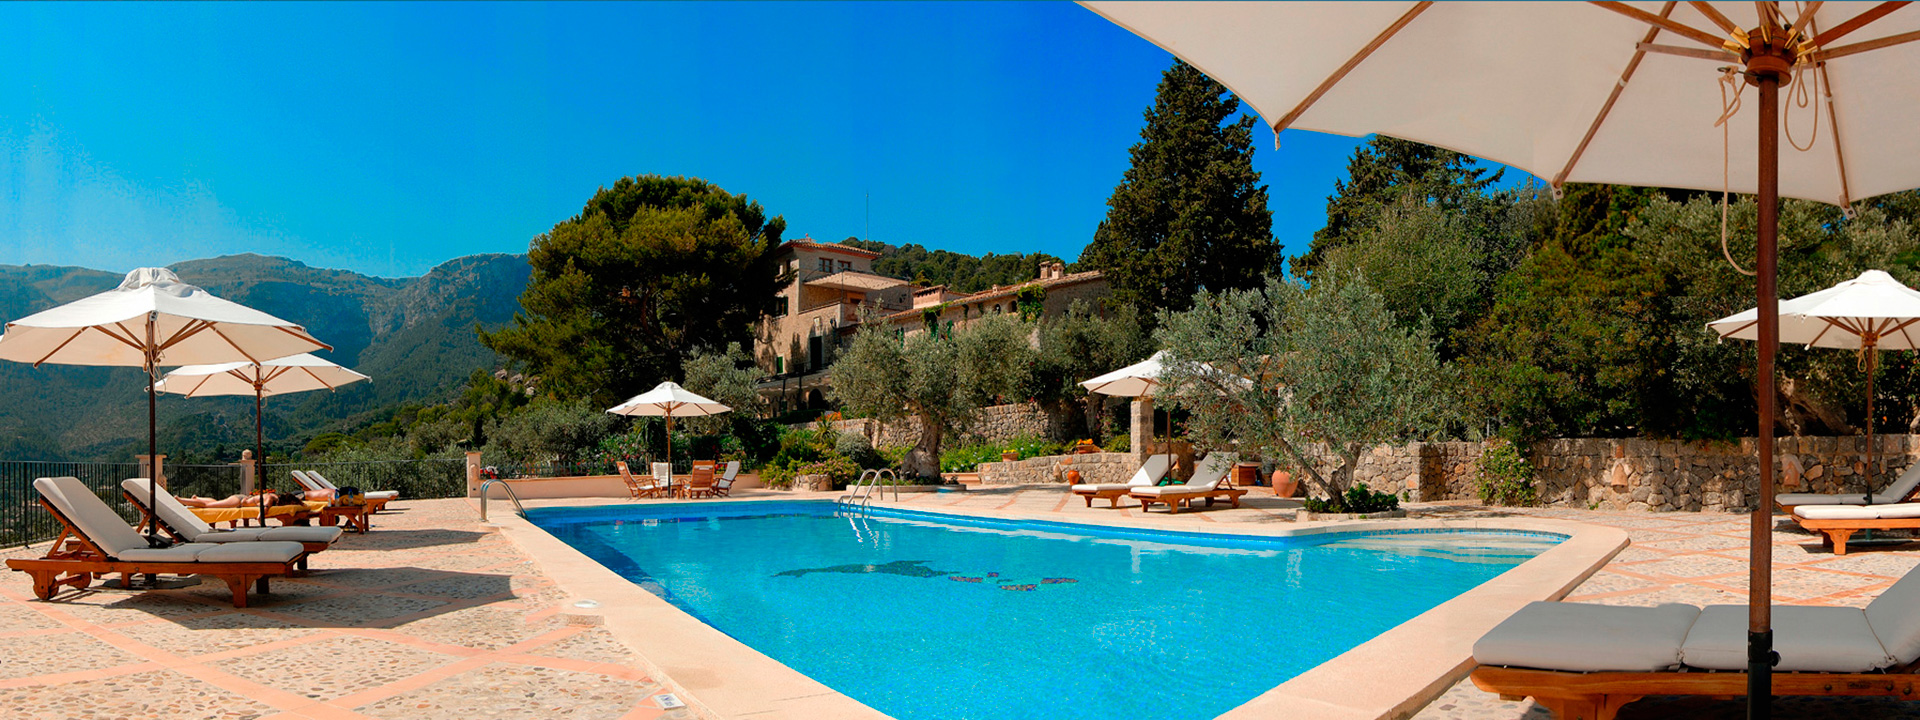 Fincaurlaub auf Mallorca und Ibiza